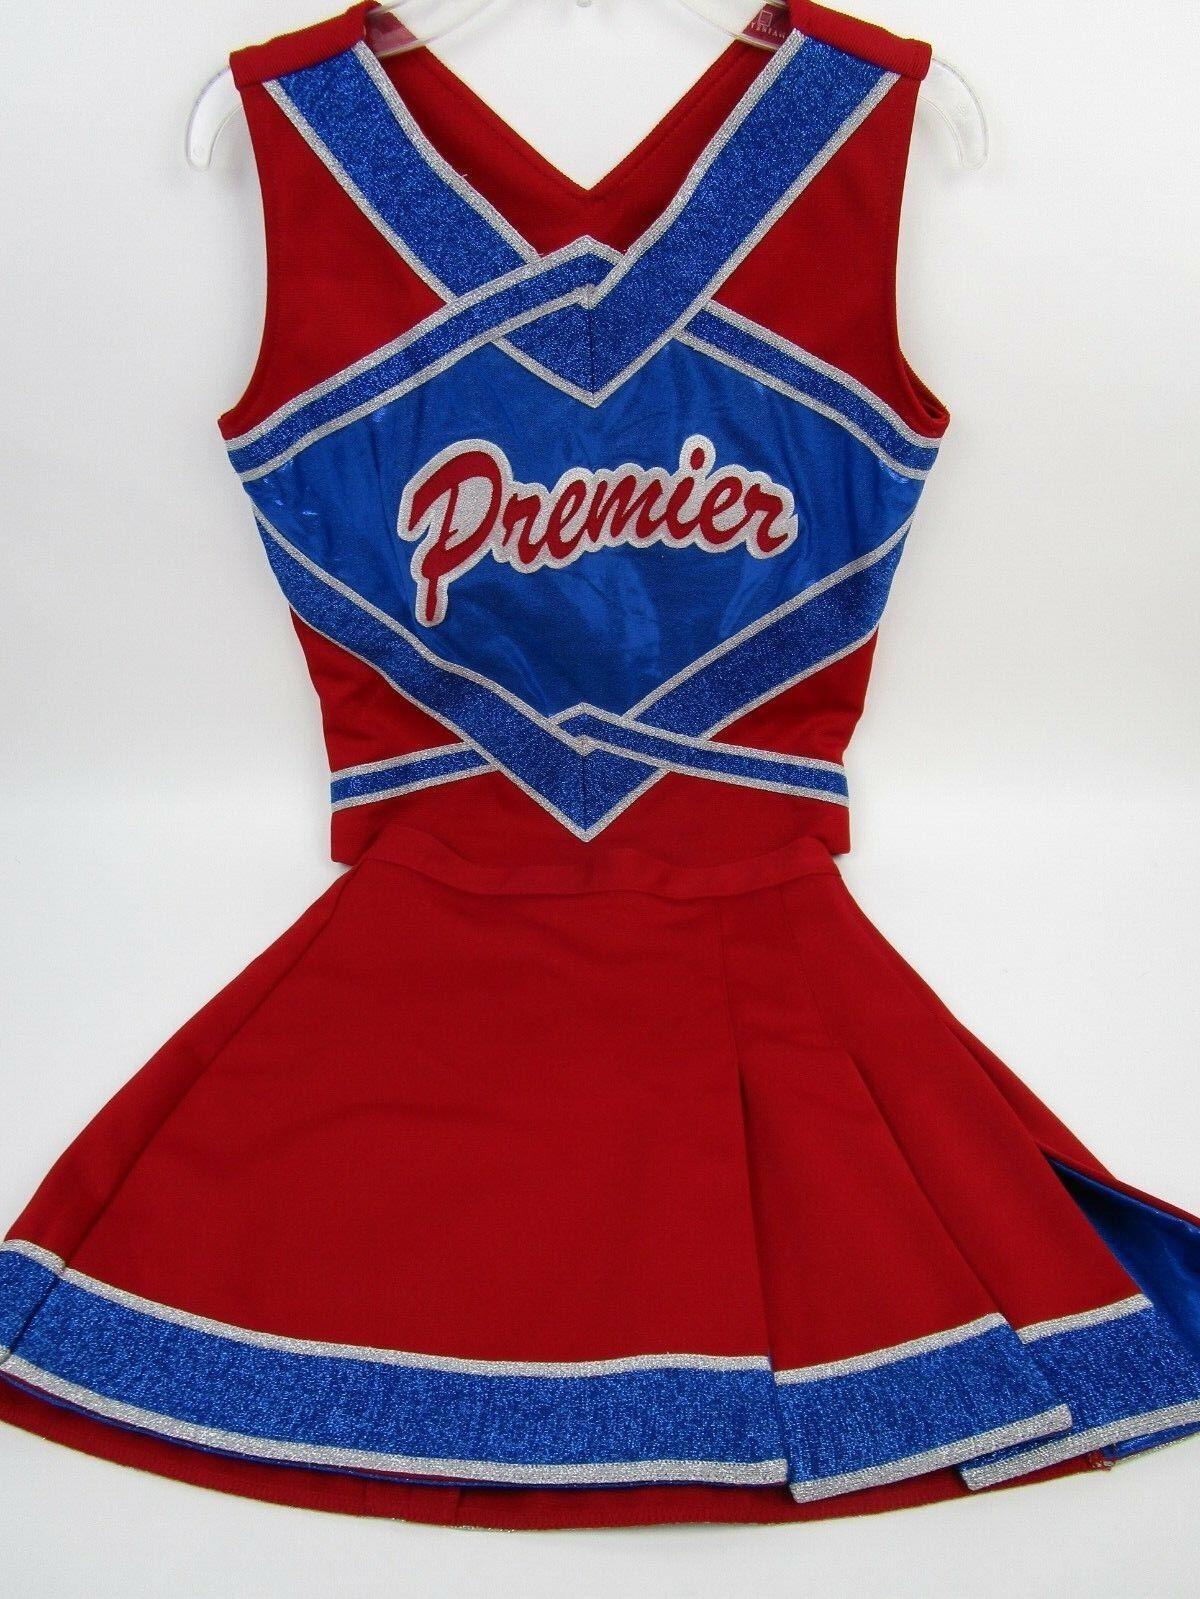 NEW PREMIER Cheerleader Uniform Outfit Costume 34  Top 25 Waist Metallic Sparkle